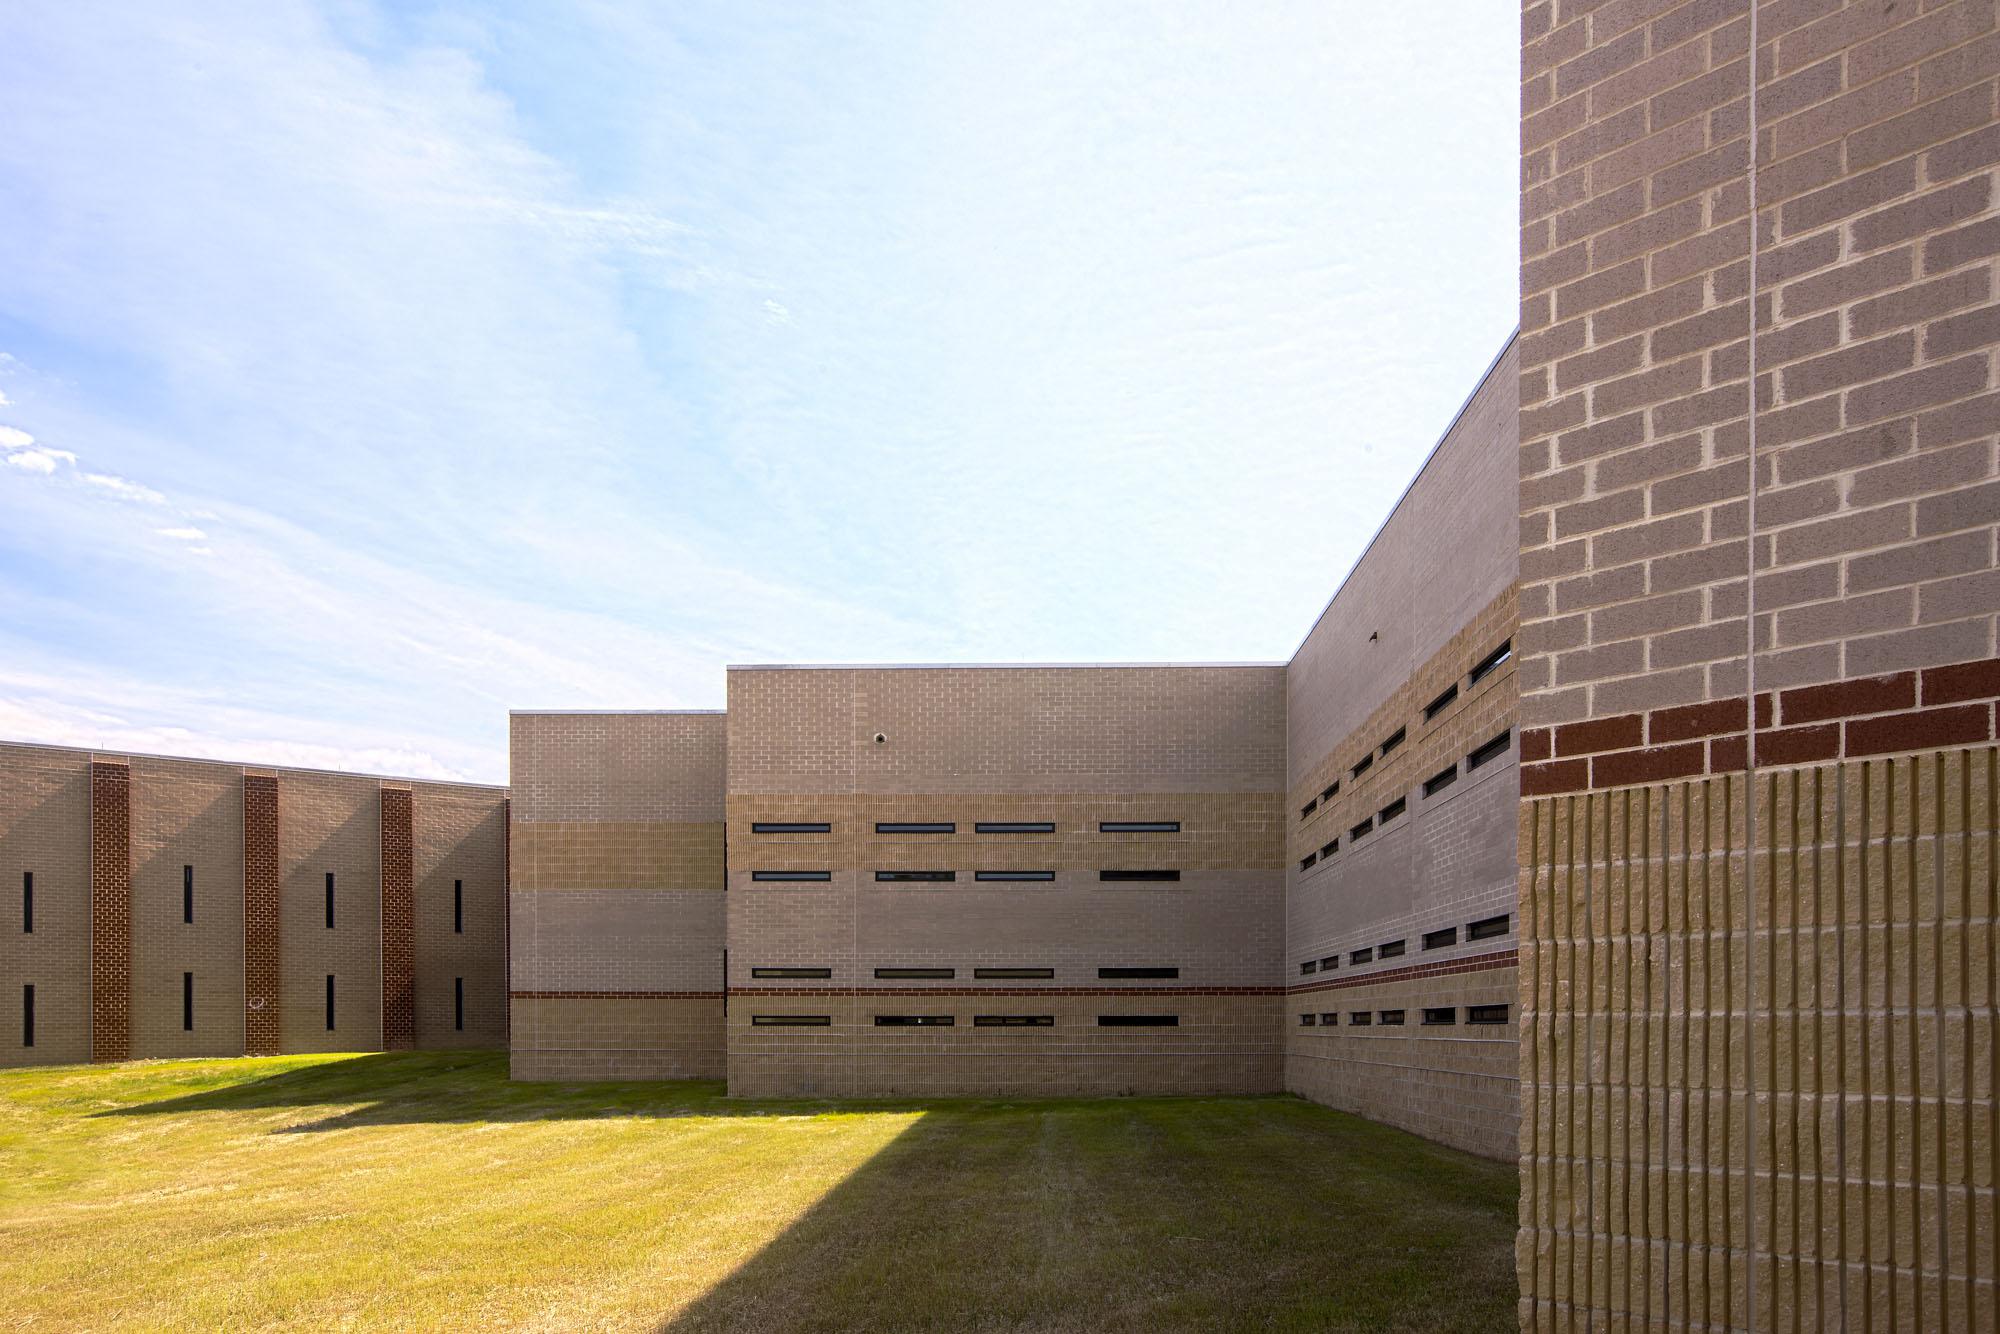 PG County Jail Exterior Image R121201.jpg